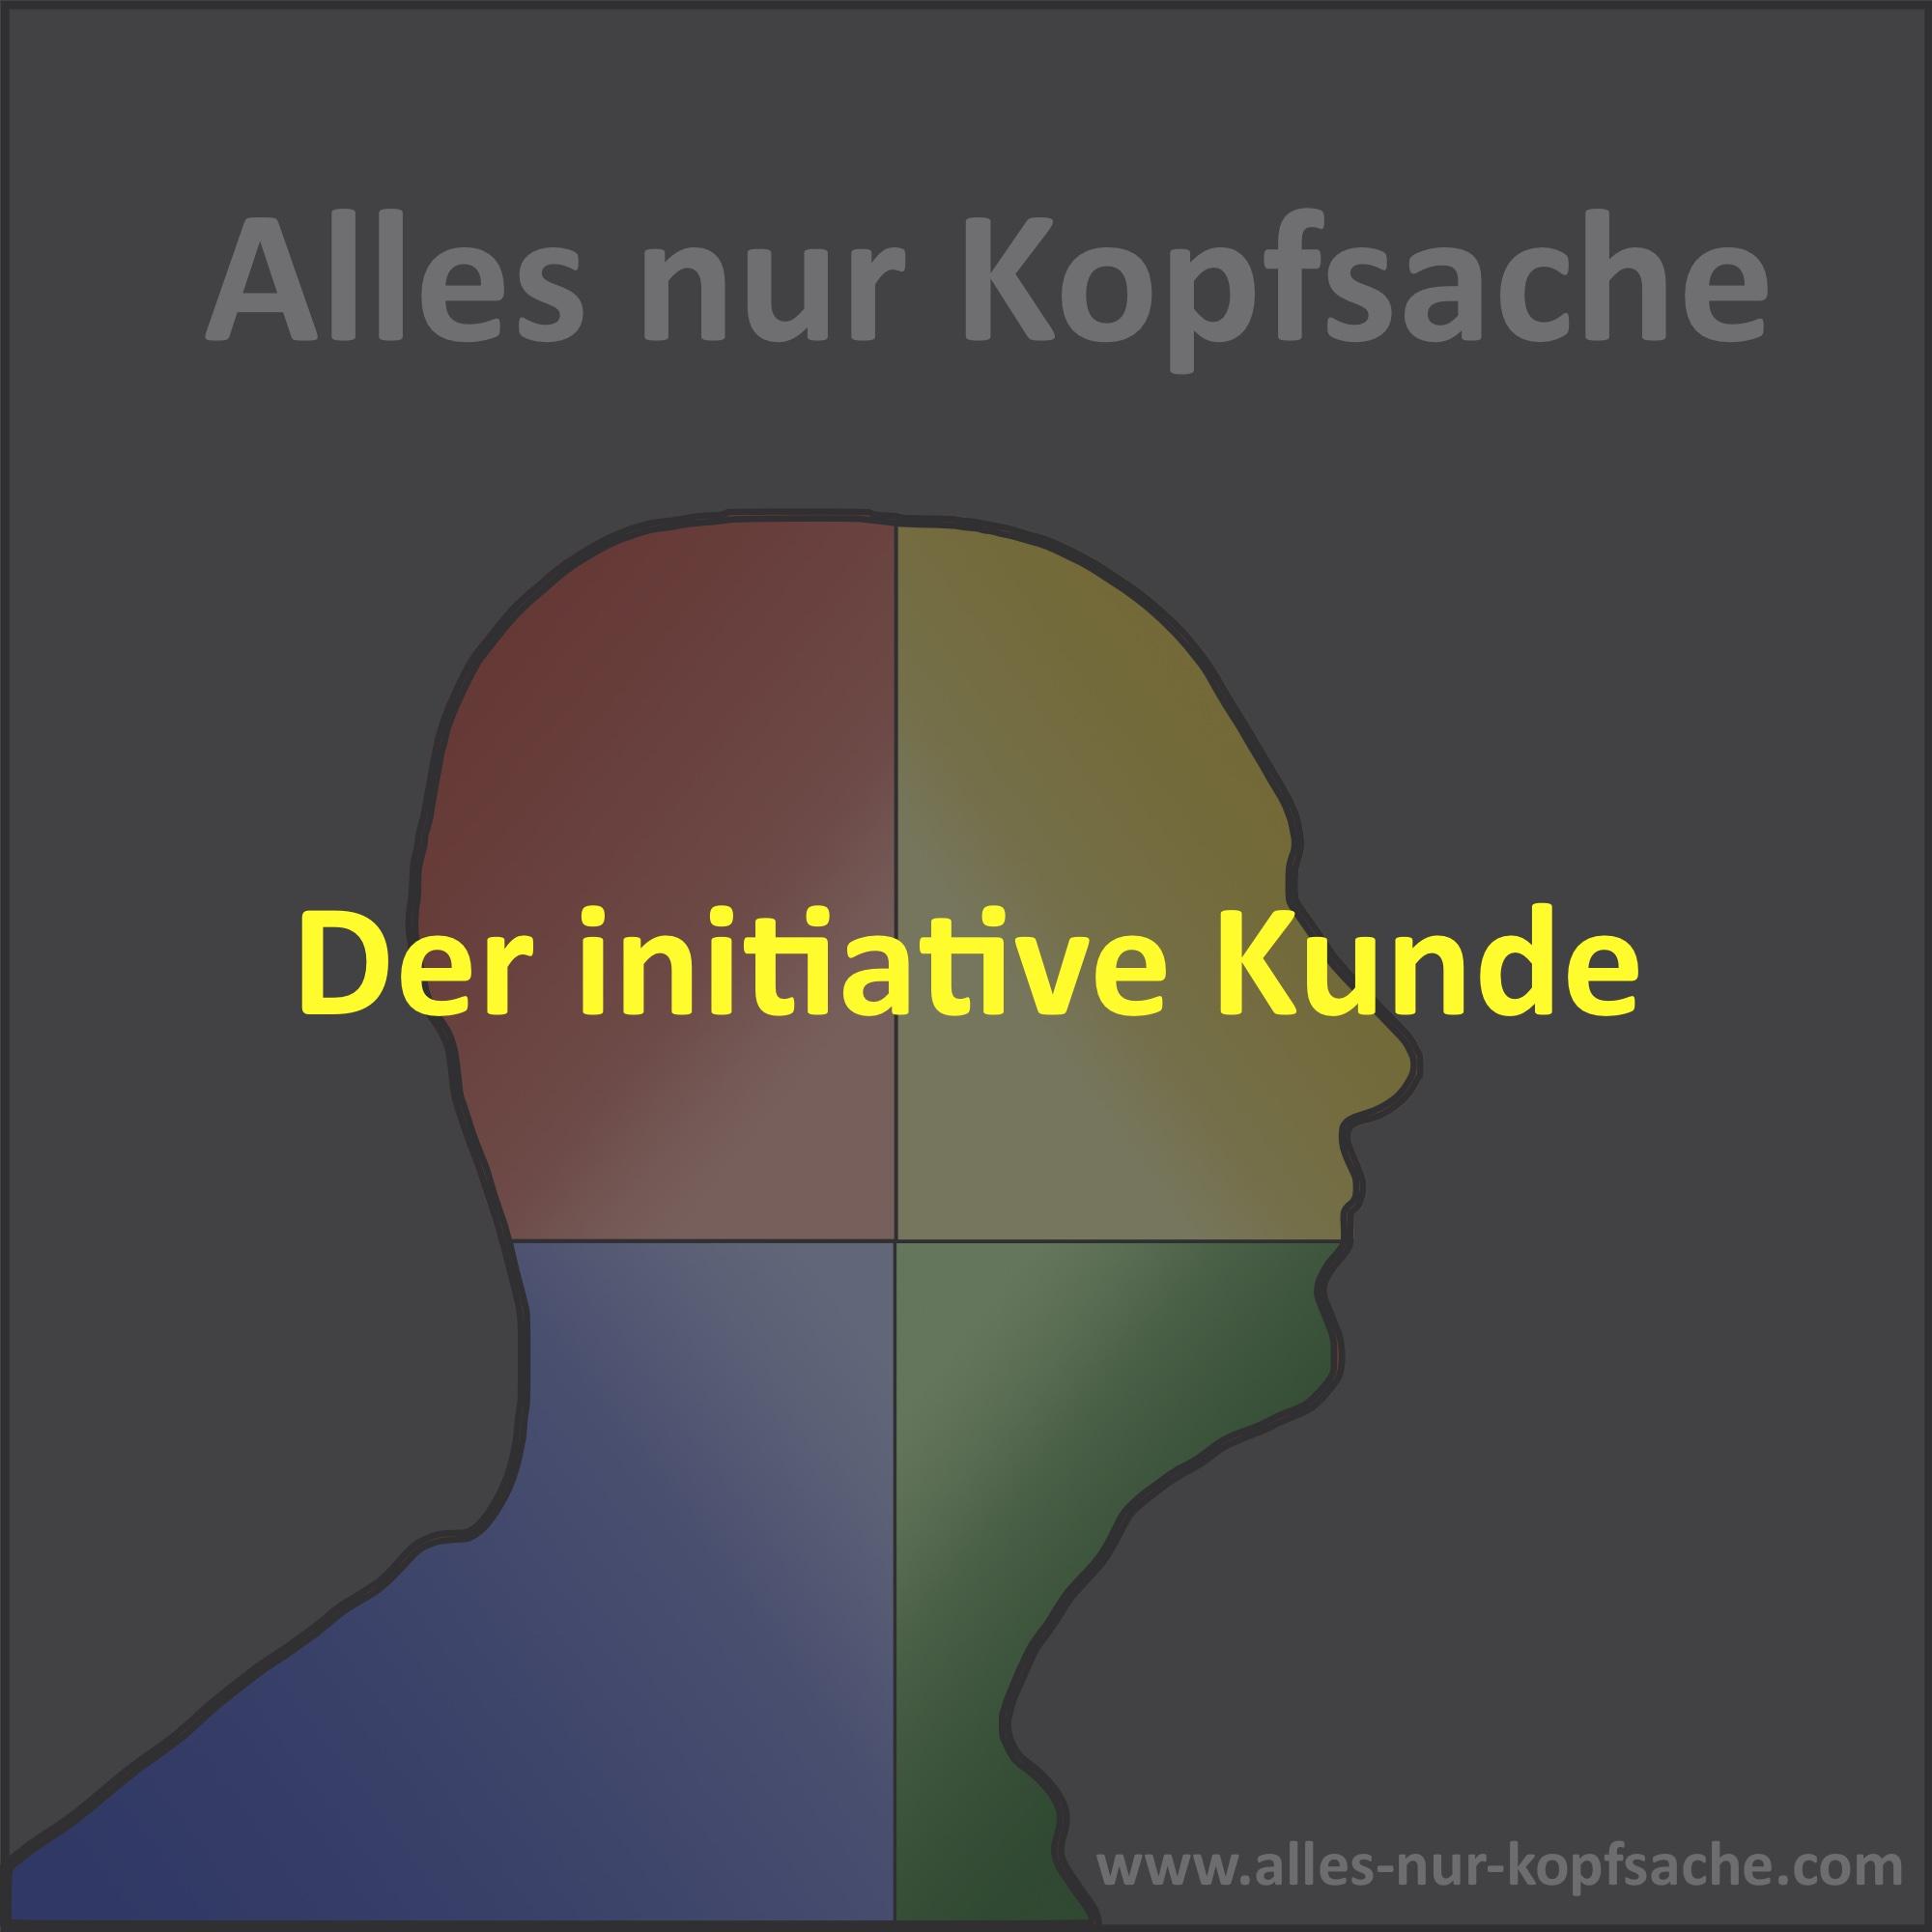 Der initiative Kunde